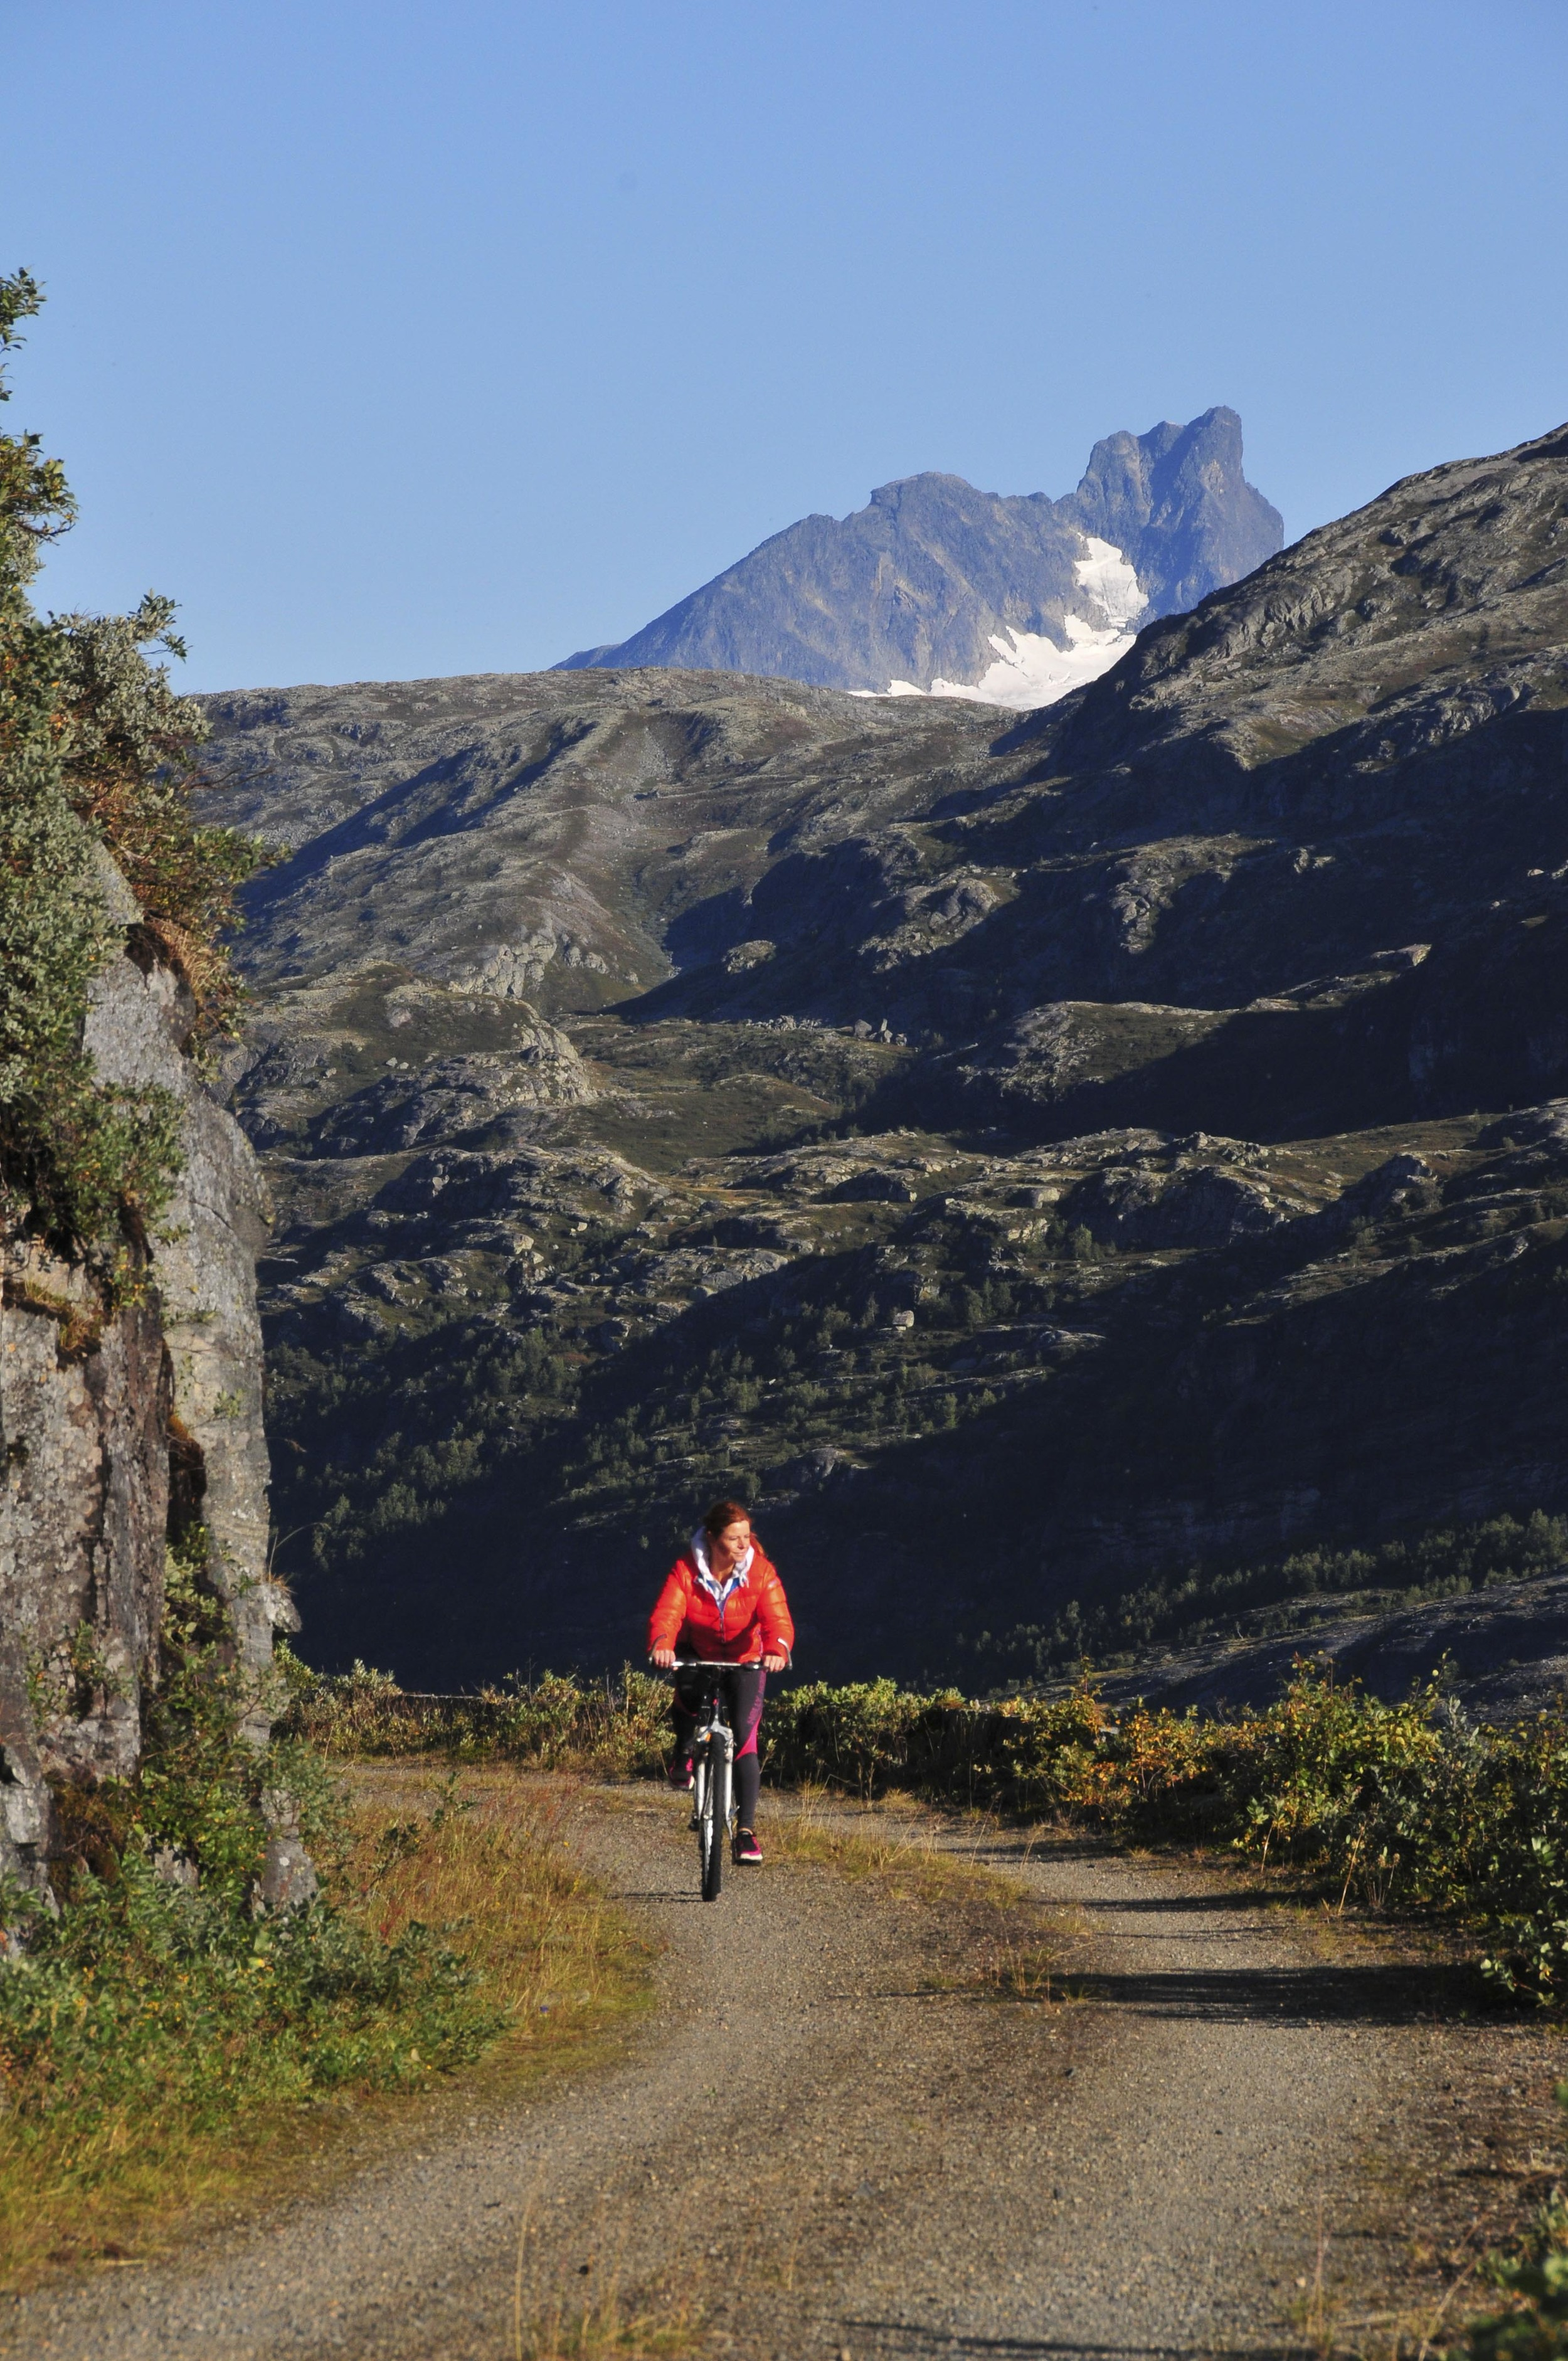 sykkeltur-Sletterust-1000-meteren (Heirsnosi)-3.jpg